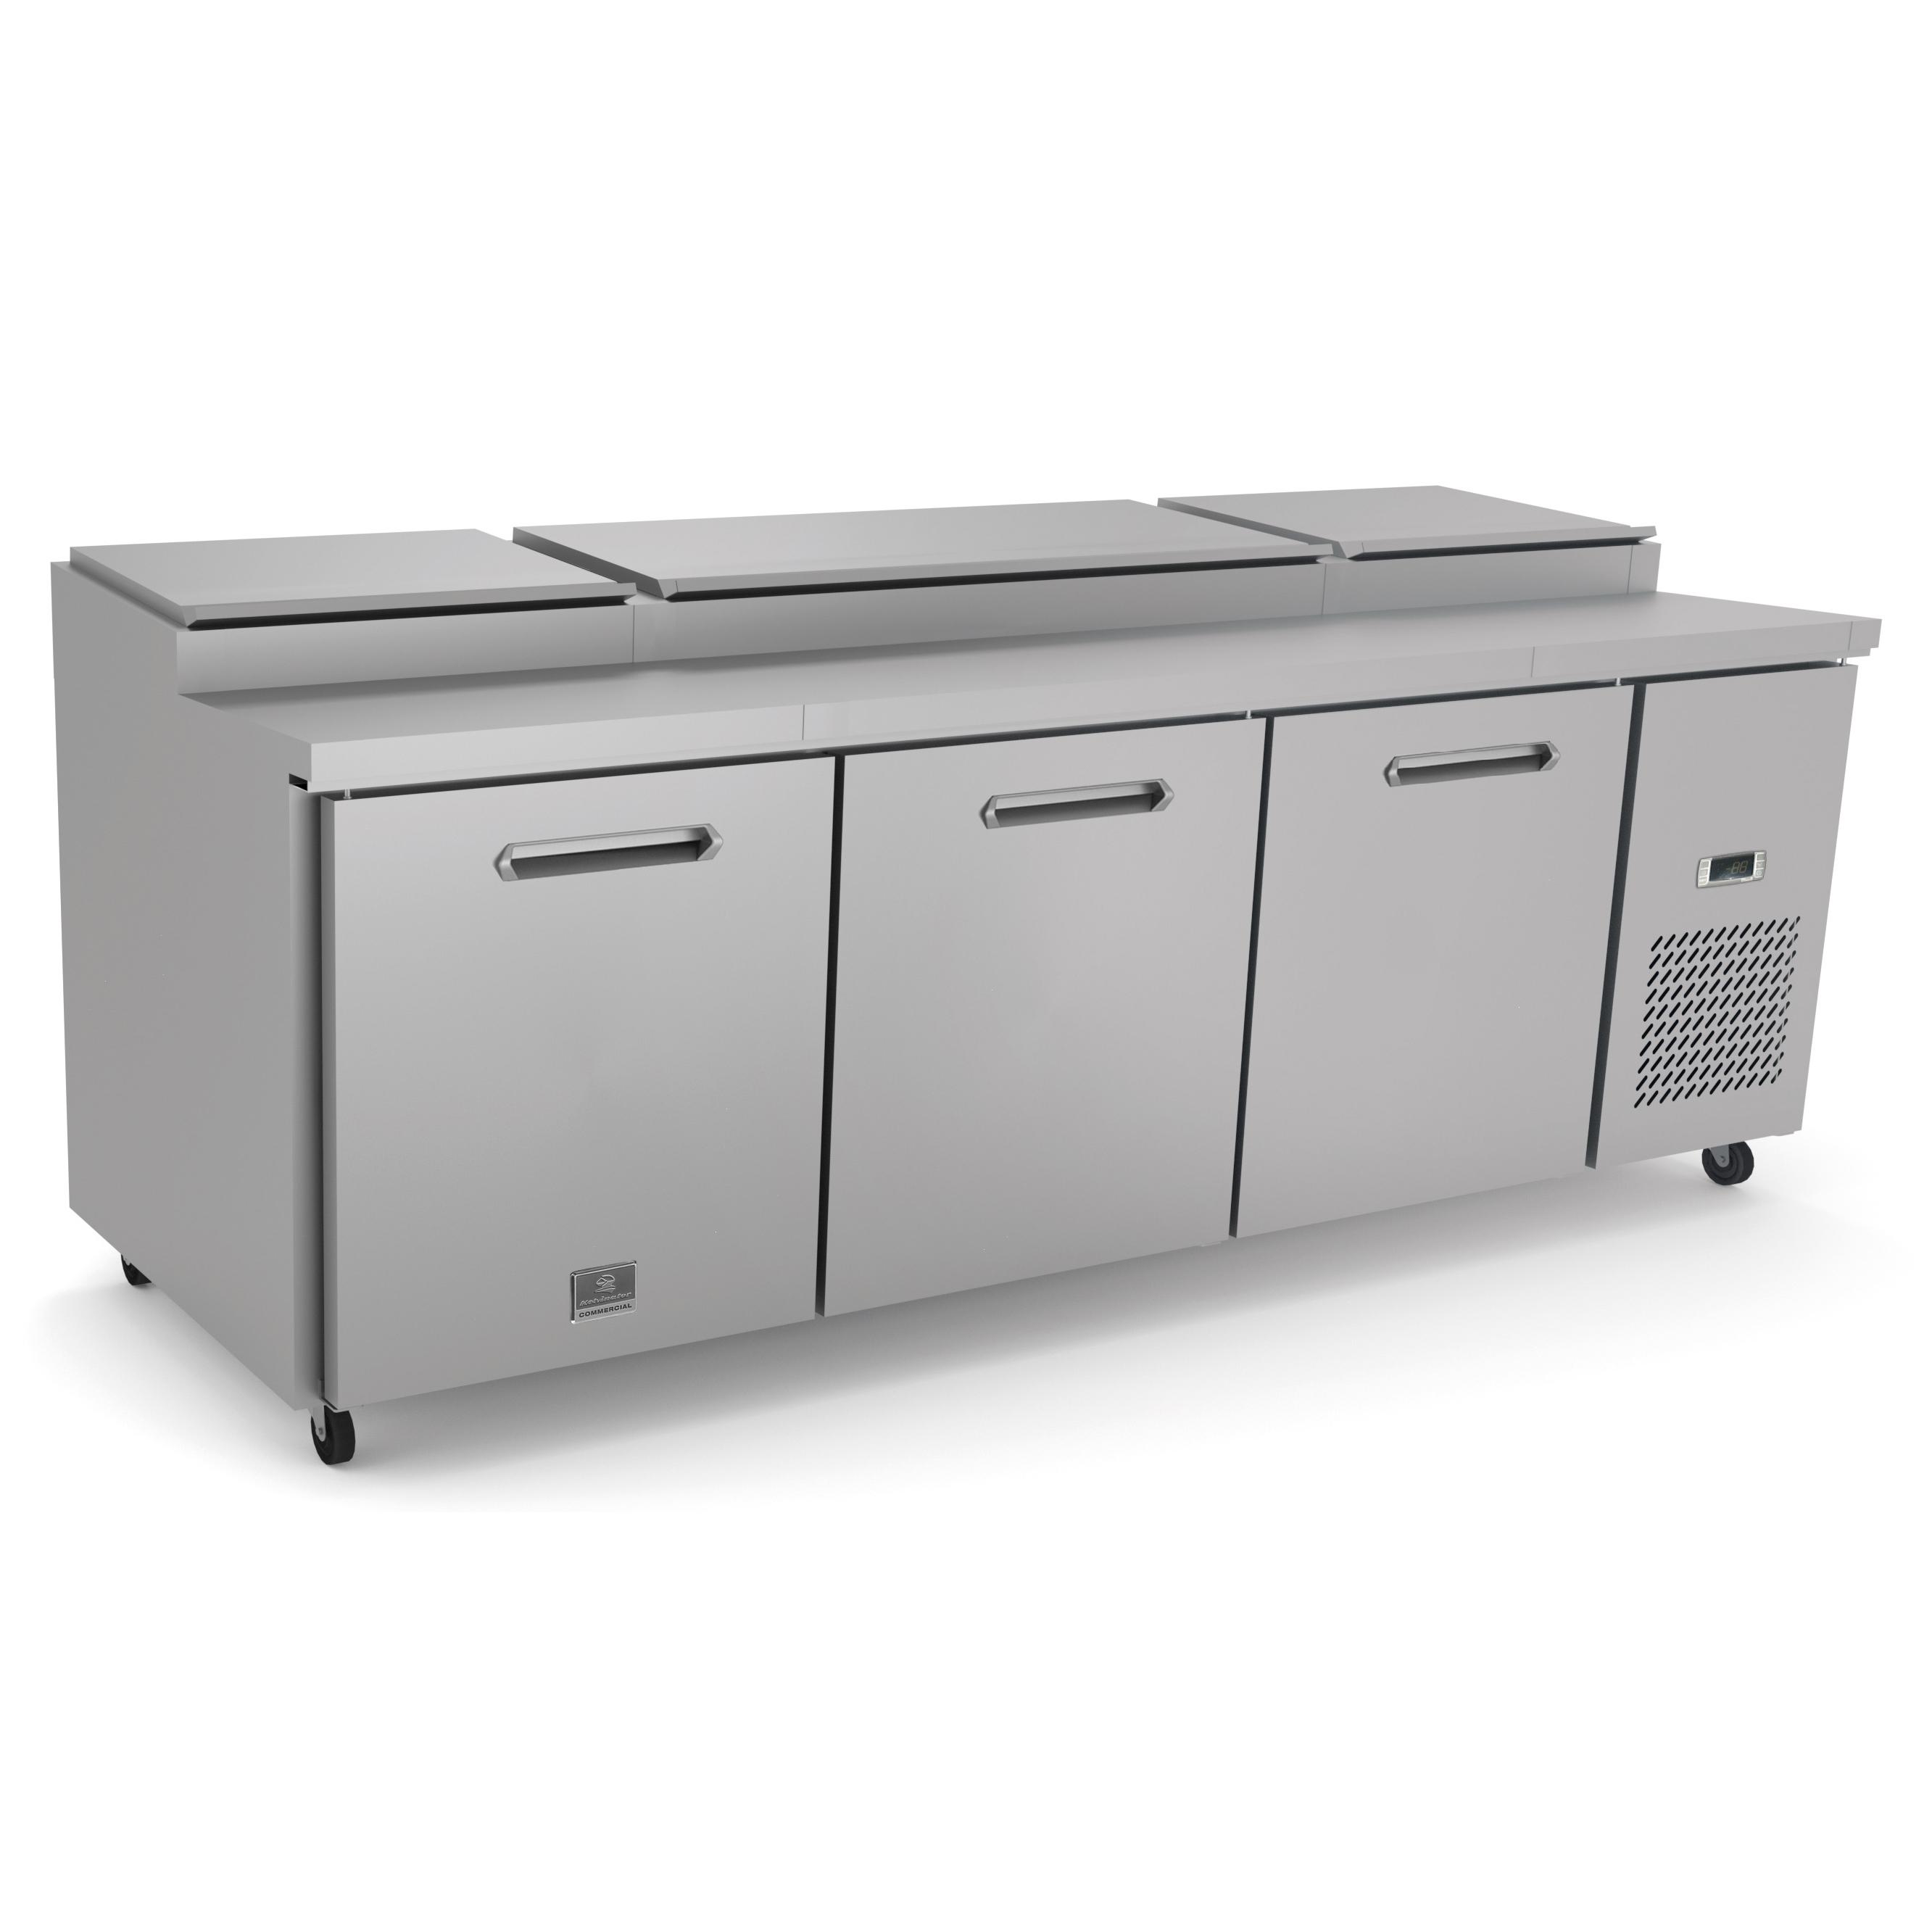 Kelvinator Commercial KCHPT92.12 refrigerated counter, pizza prep table